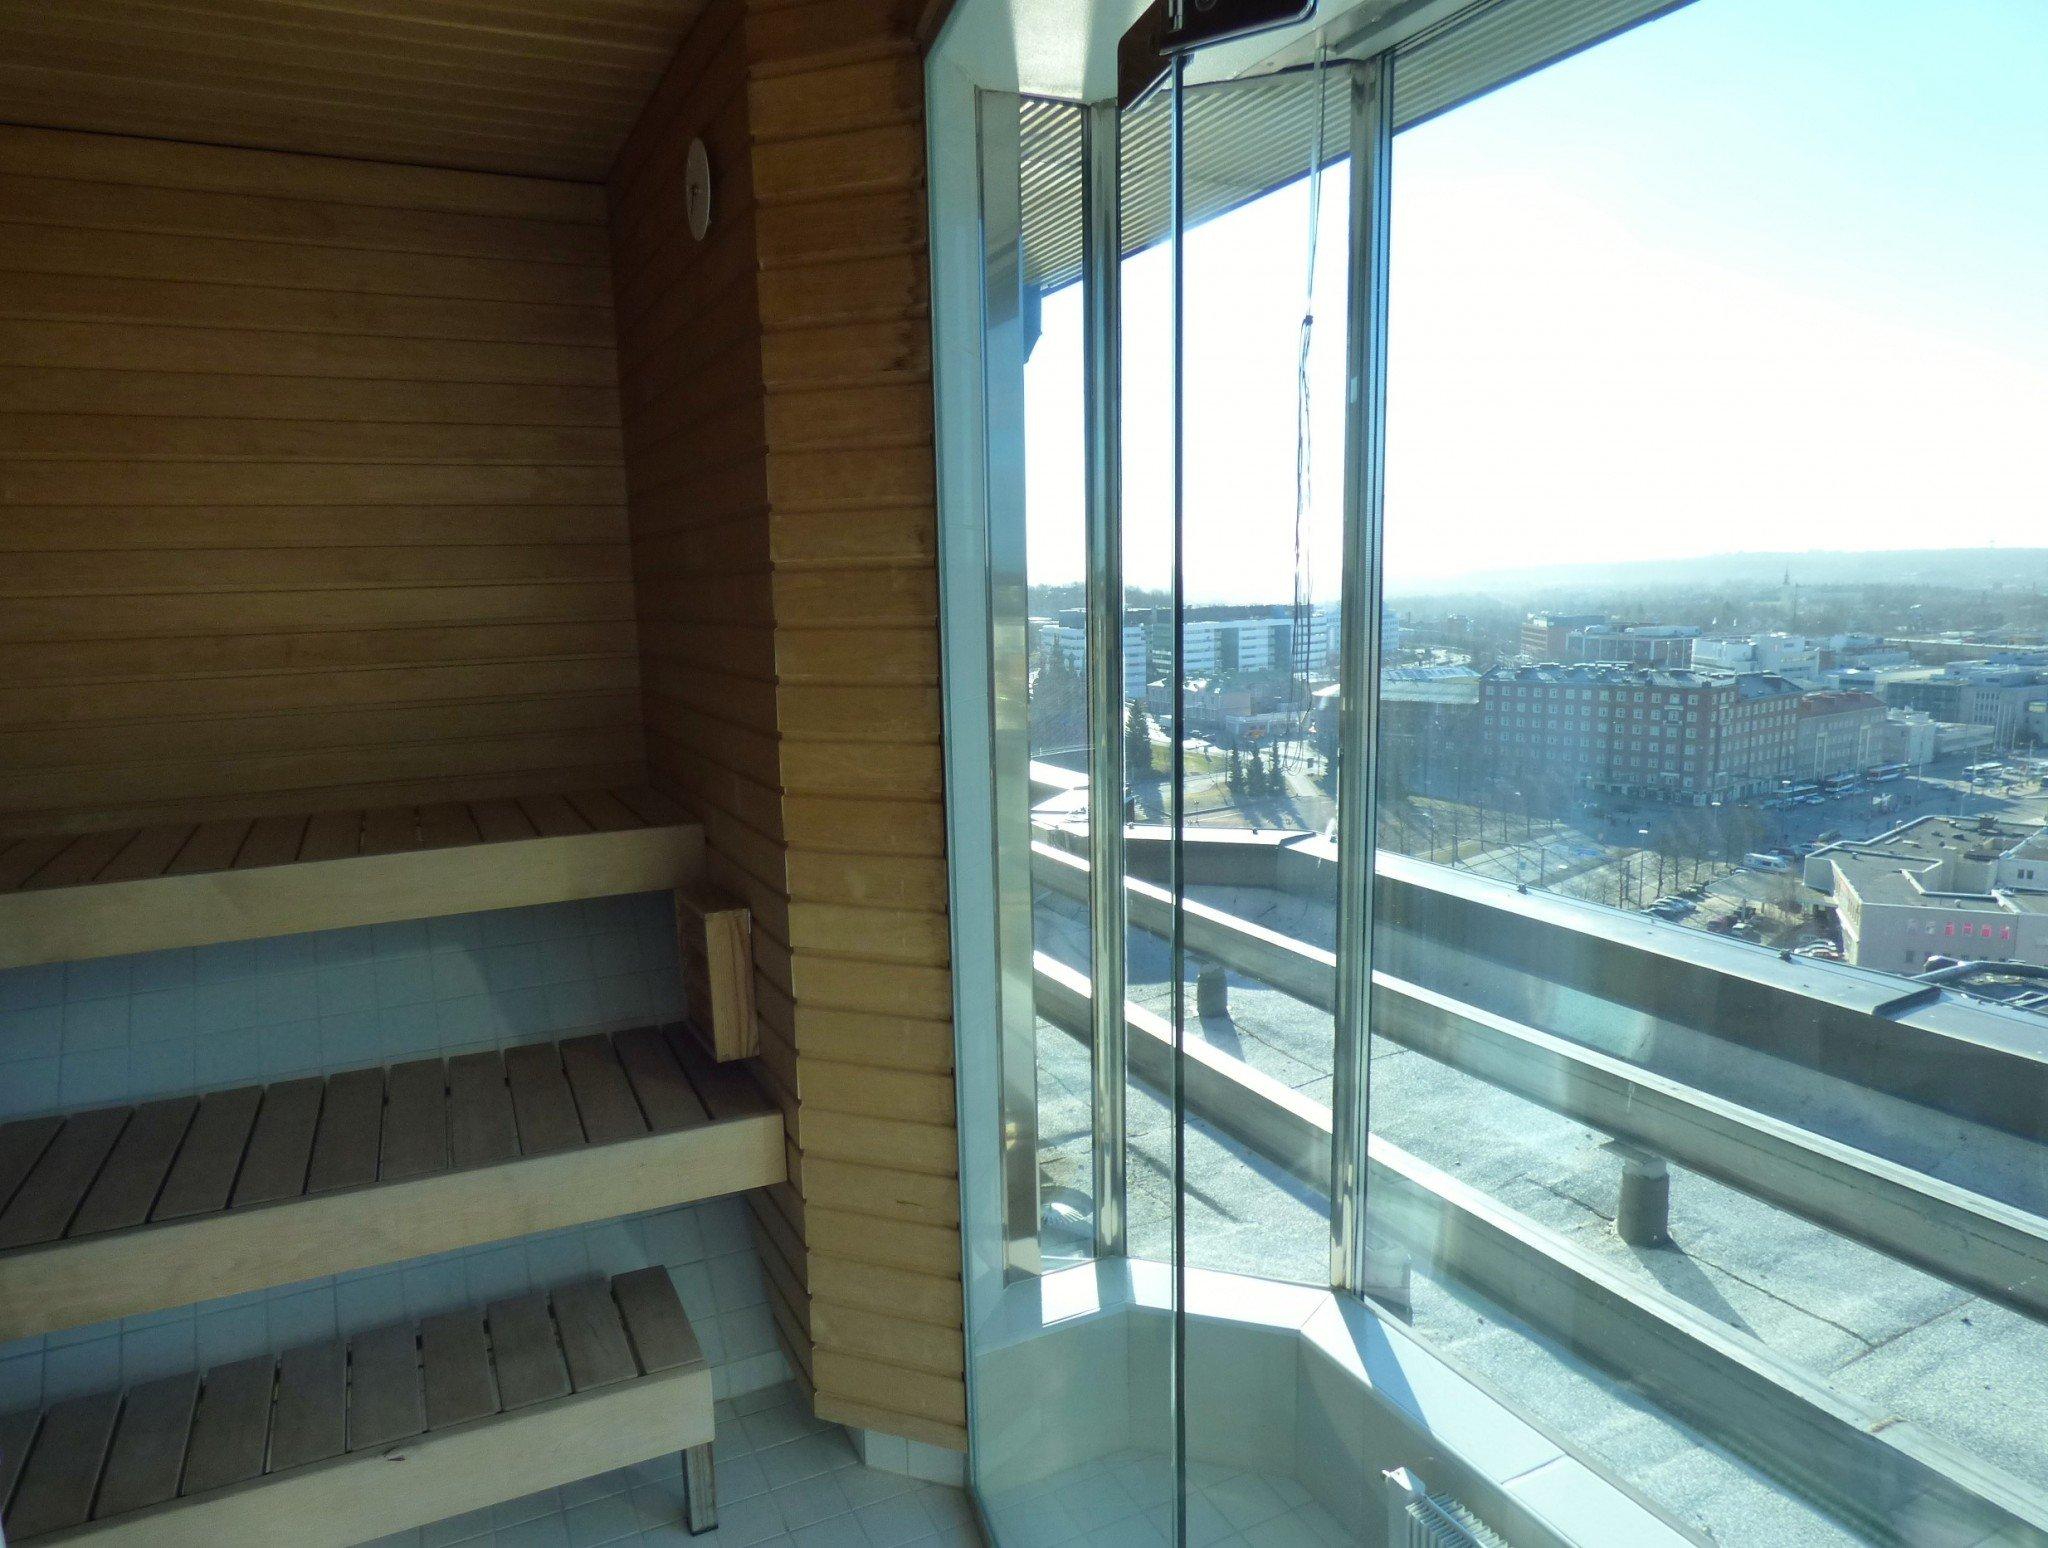 Sokos Hotel Ilves kabinetti